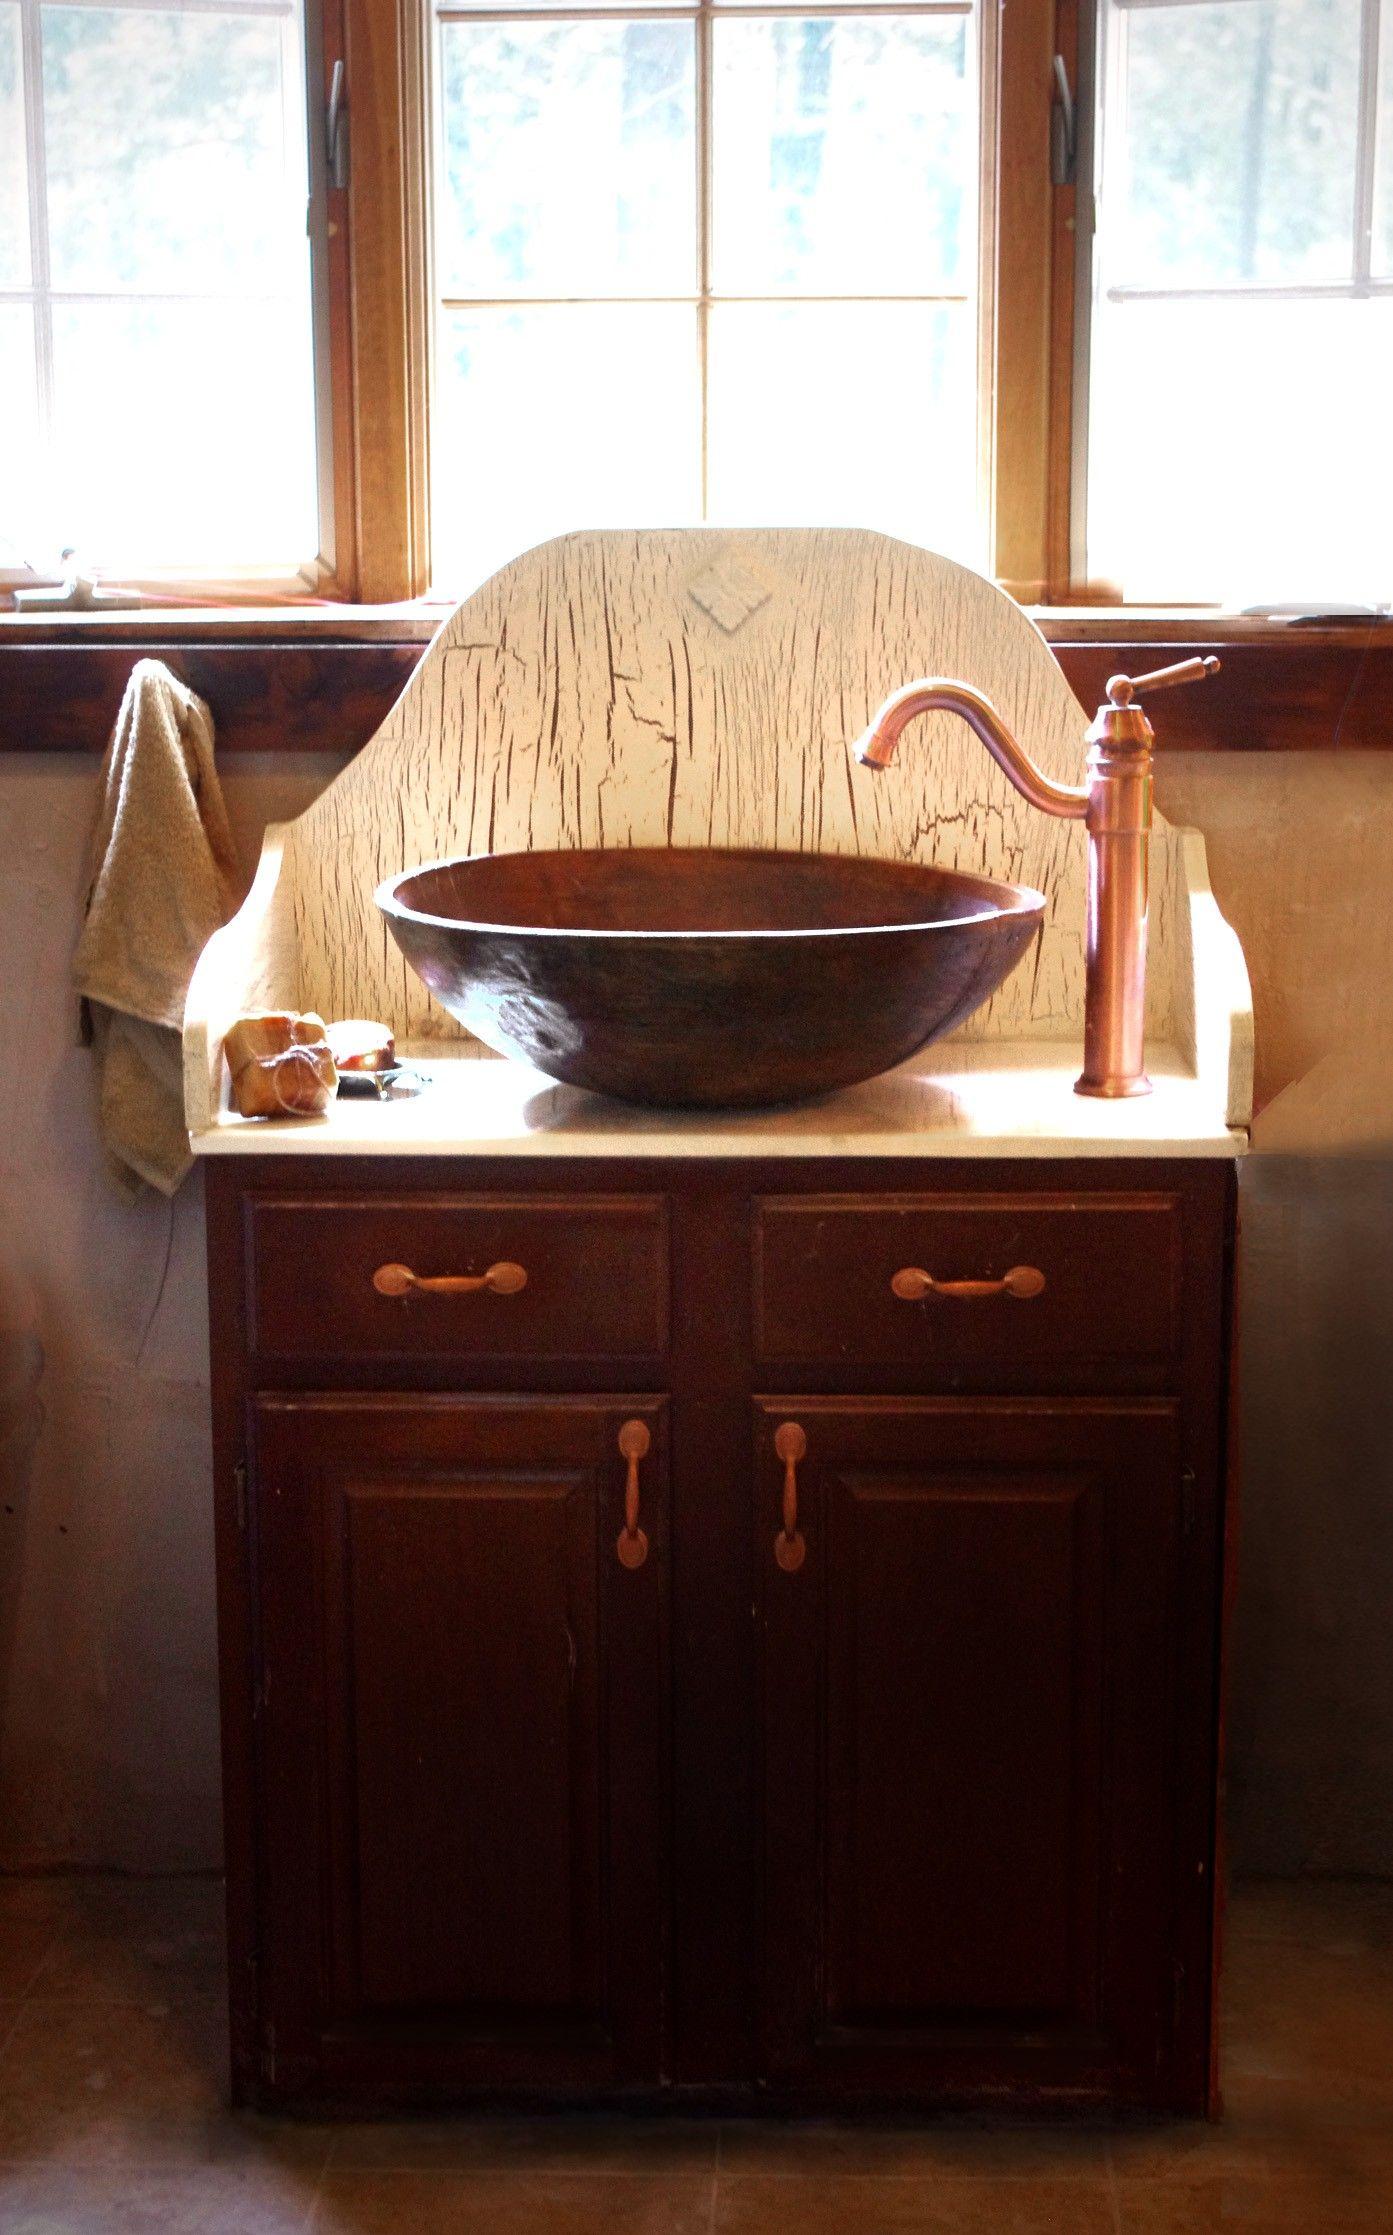 Vintage Brown Stained Wooden Vanities With Copper Vessel Sink And Bronze Metal Vessel Sink Diy Vintage Bathroom Sinks Bathroom Sink Bowls